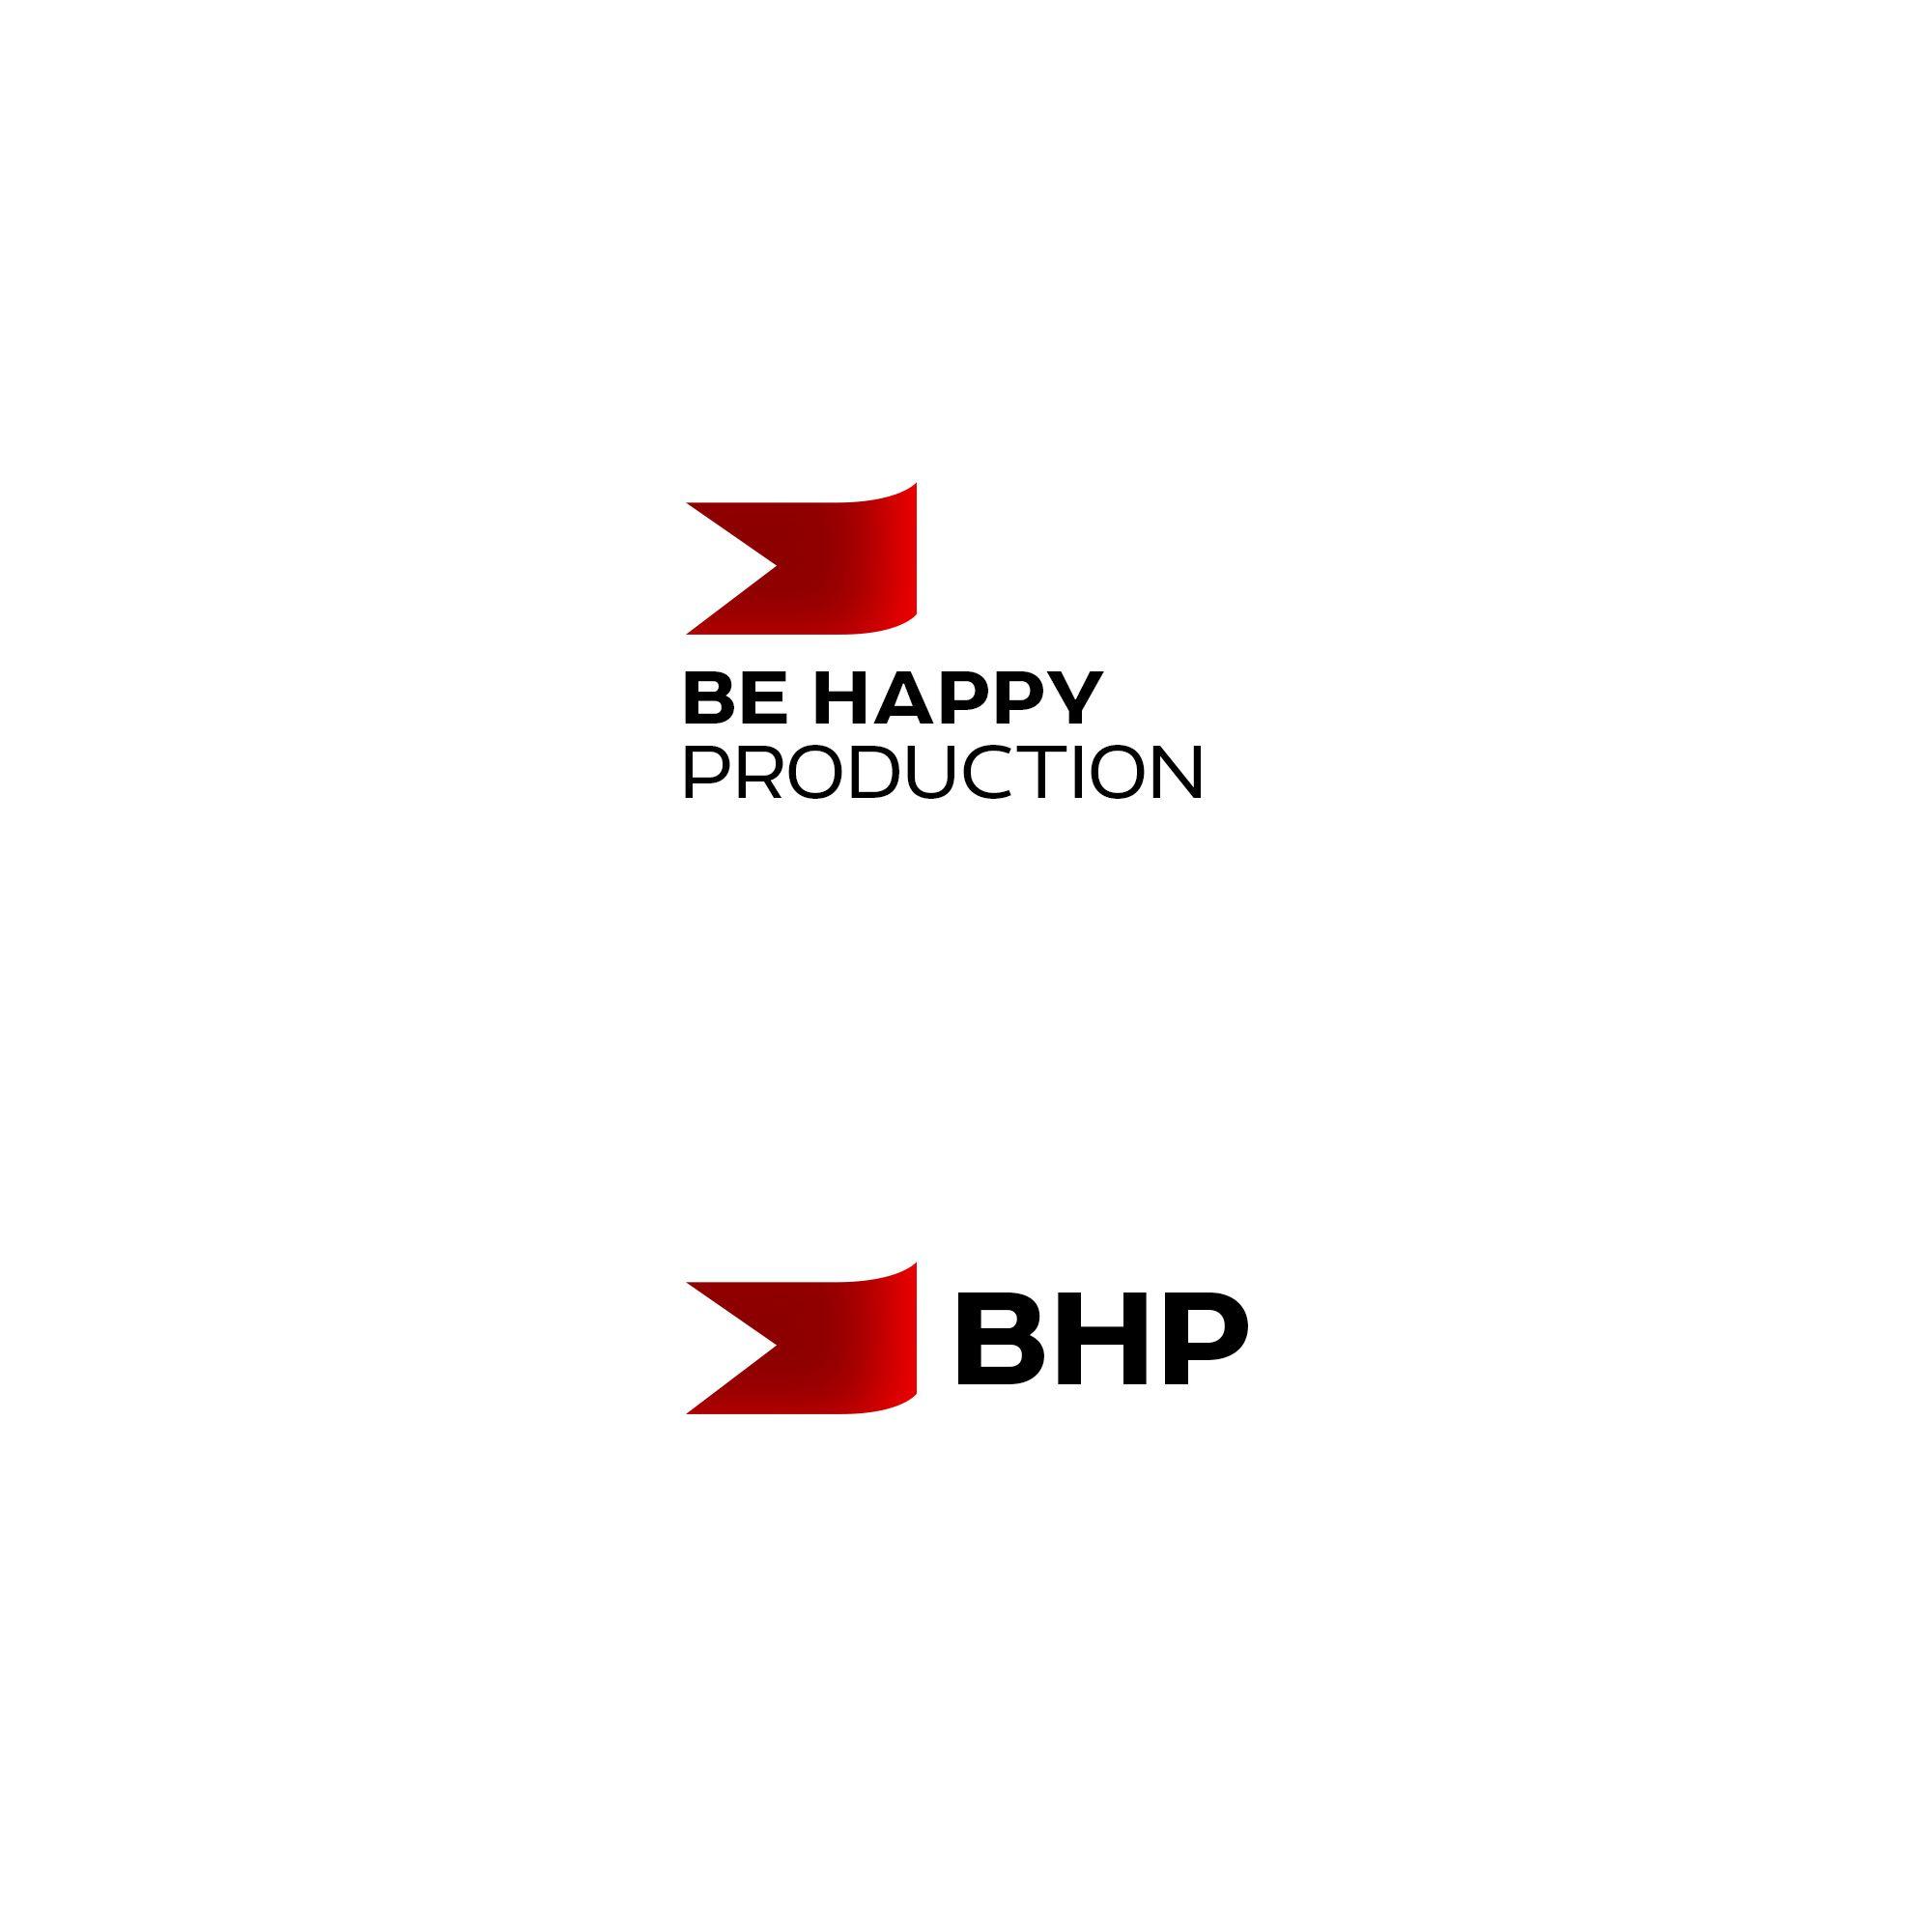 Логотип для Be Happy Production  - дизайнер weste32